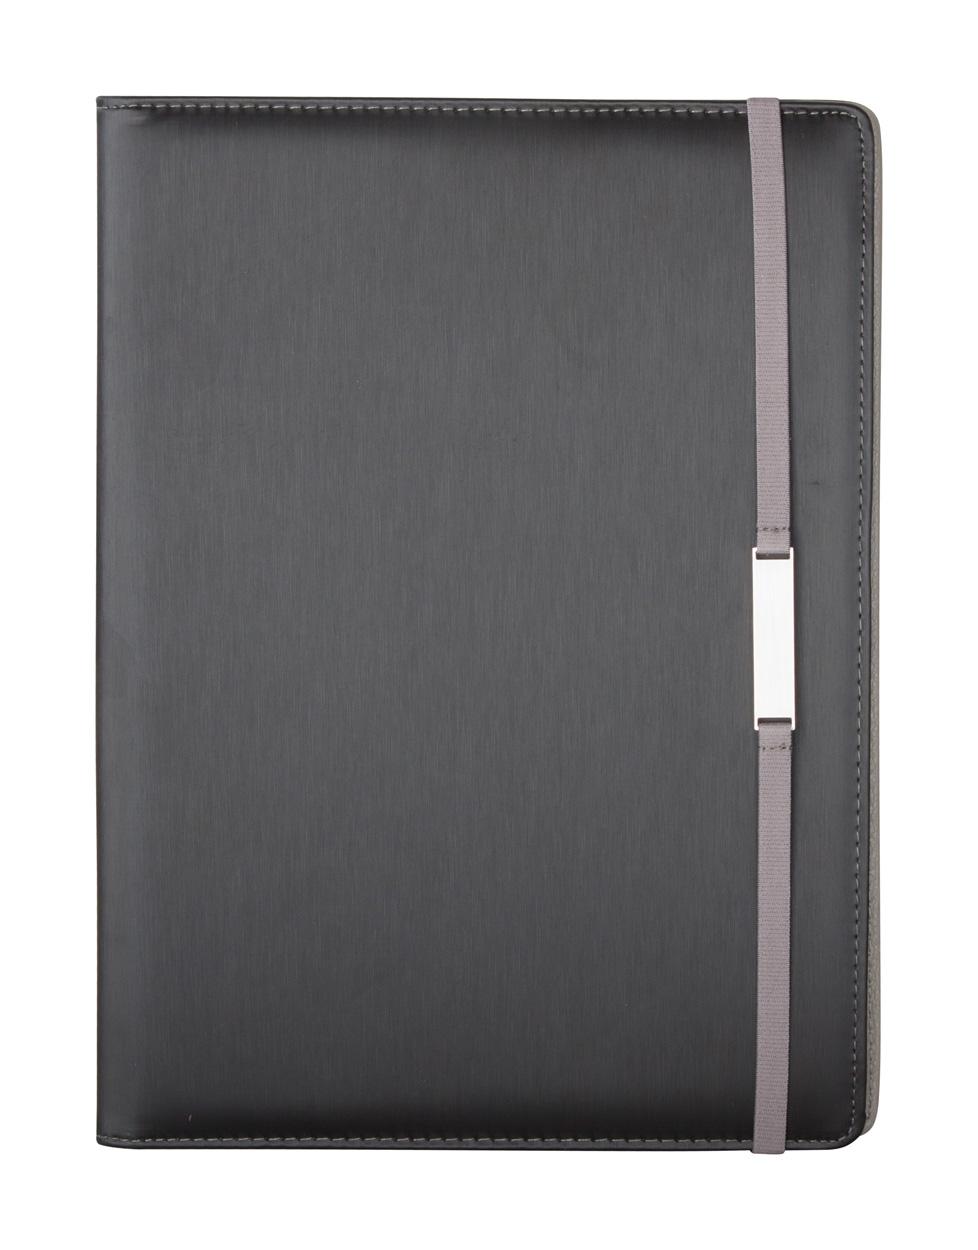 Bonza A4 iPad® document folder